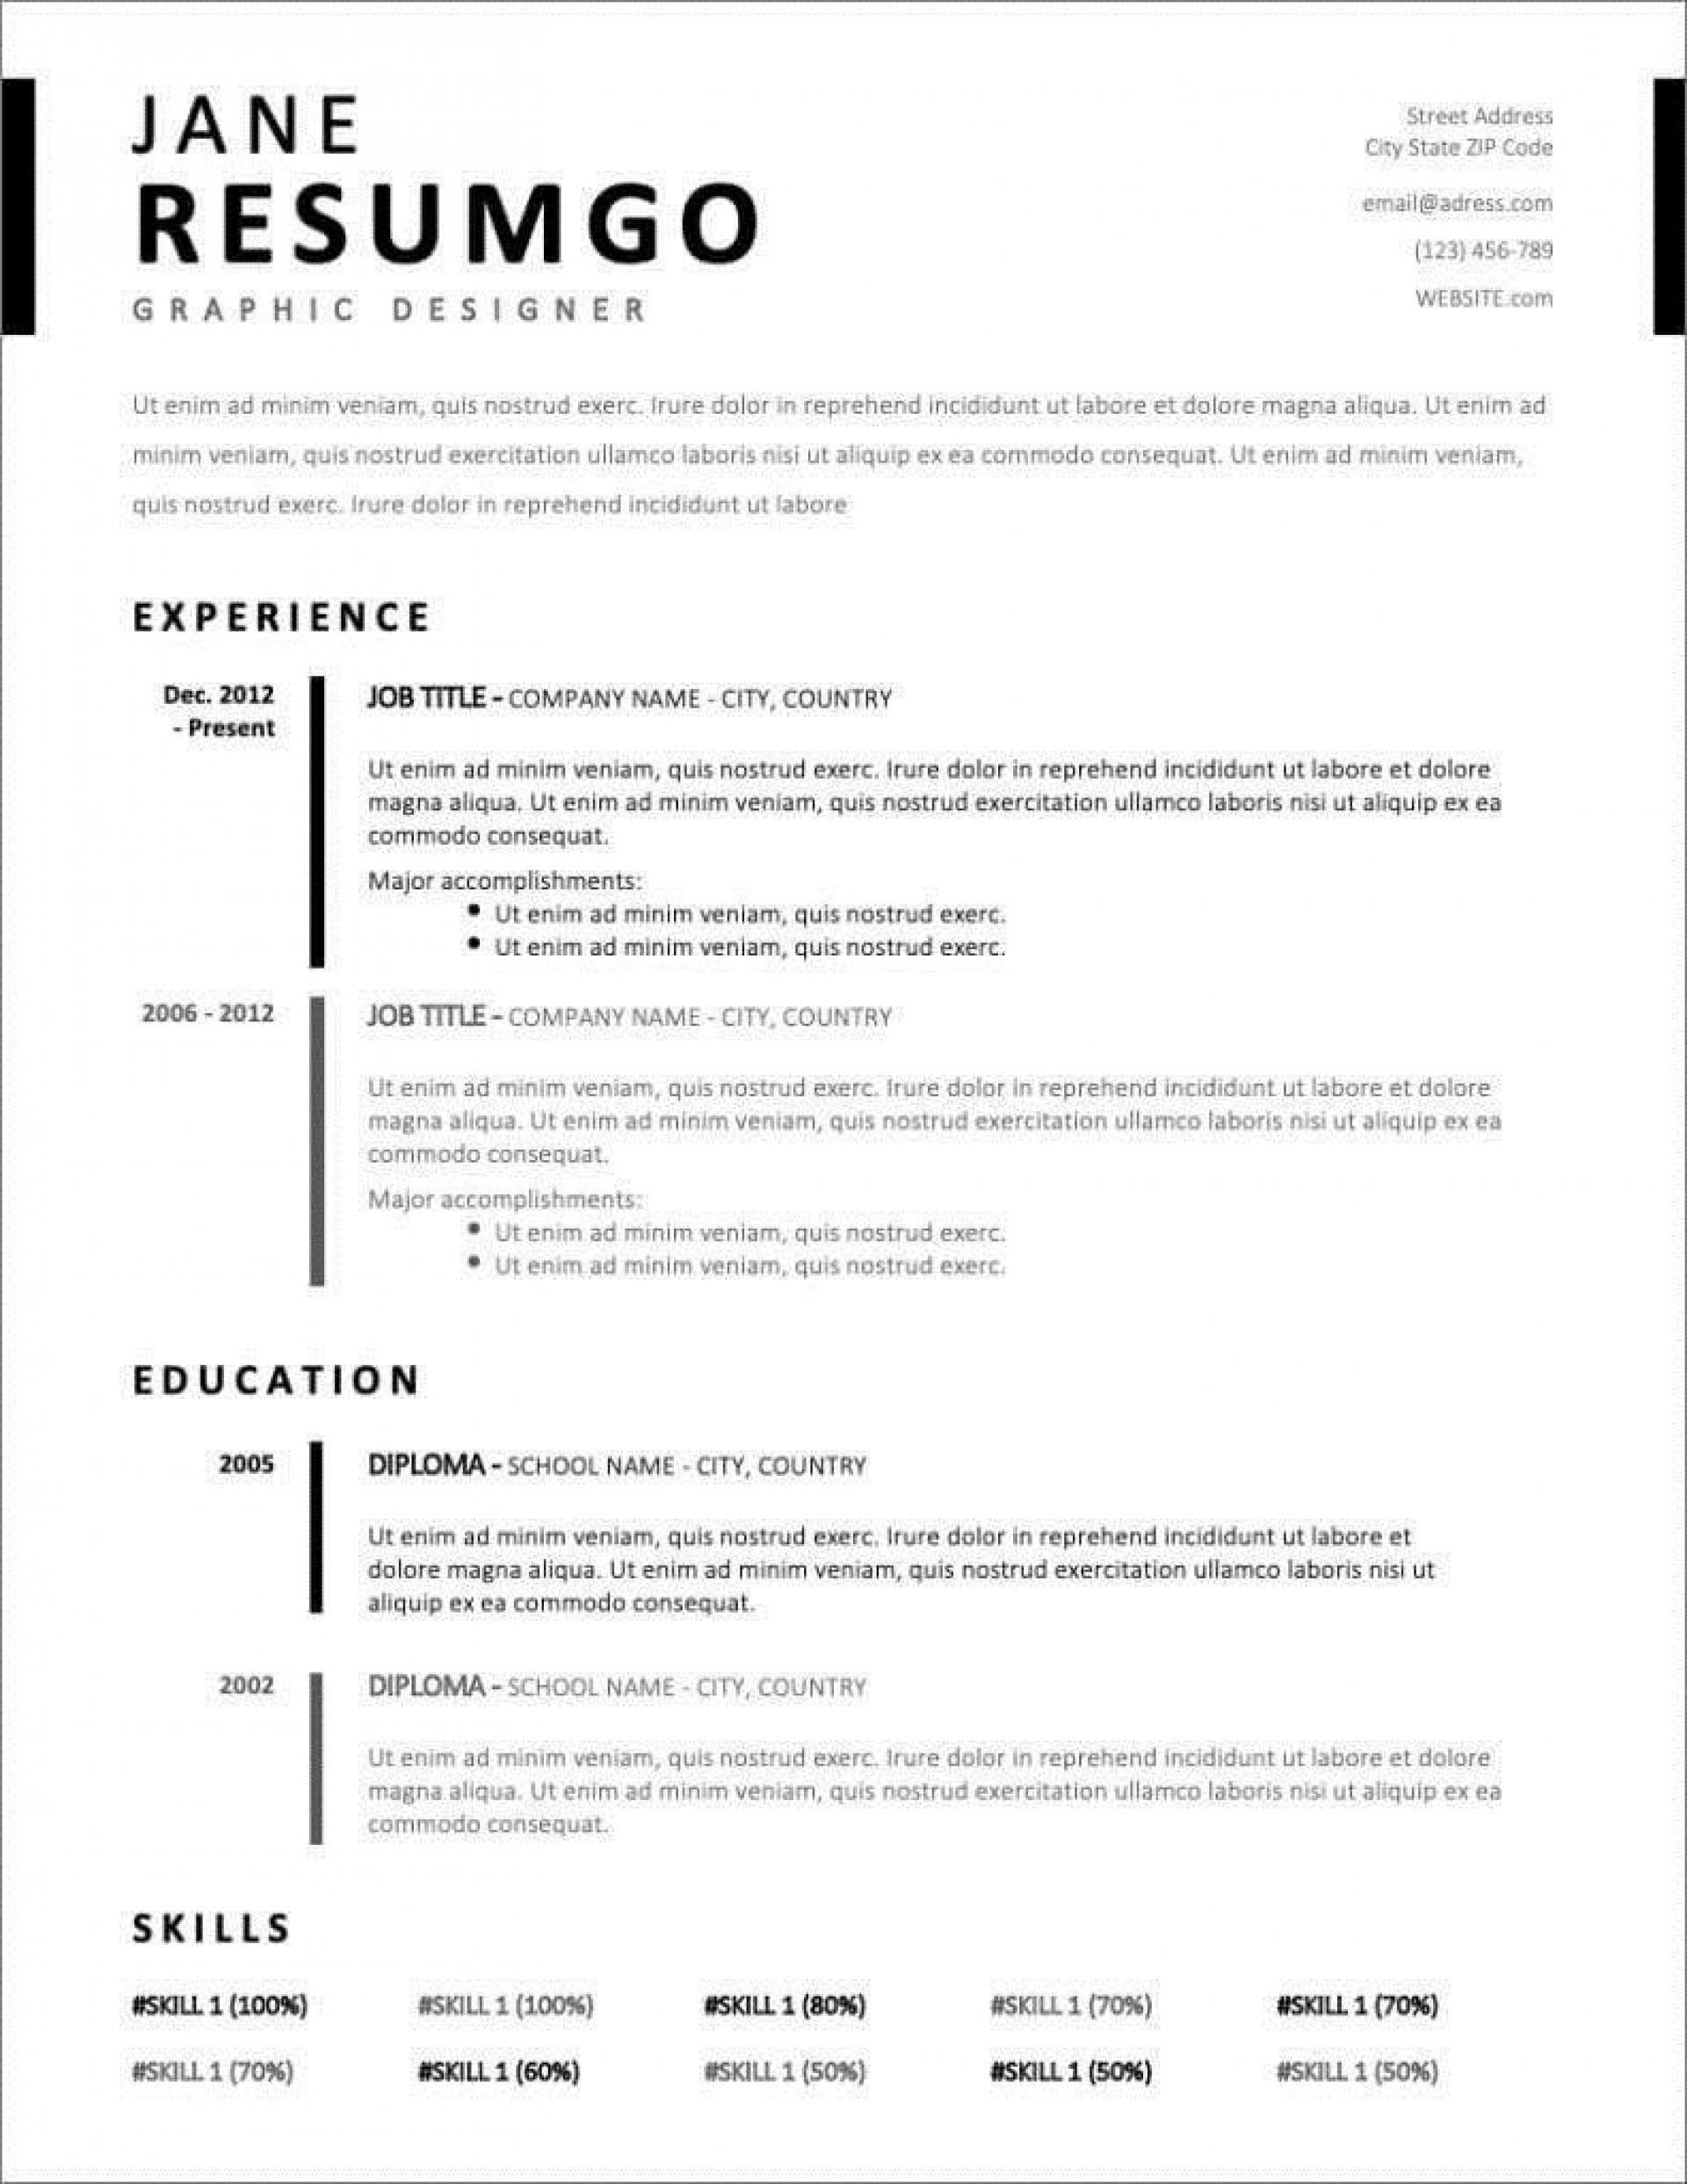 008 Breathtaking Free Printable Resume Template Pdf Design 1920